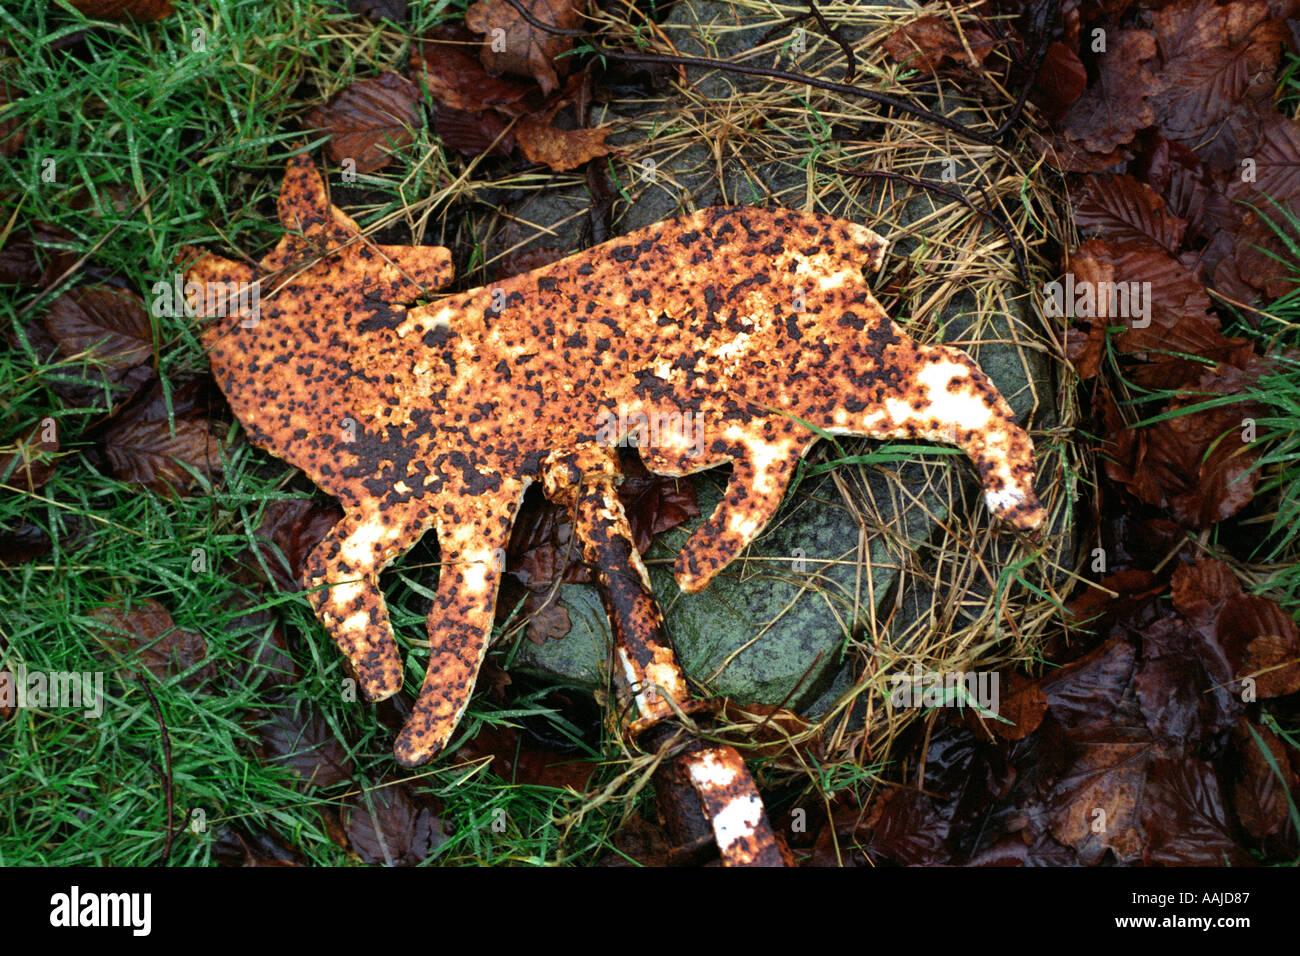 A Fox Profile In Metal The Symbol Of Bedlinog Rfc Glamorgan Wales Uk